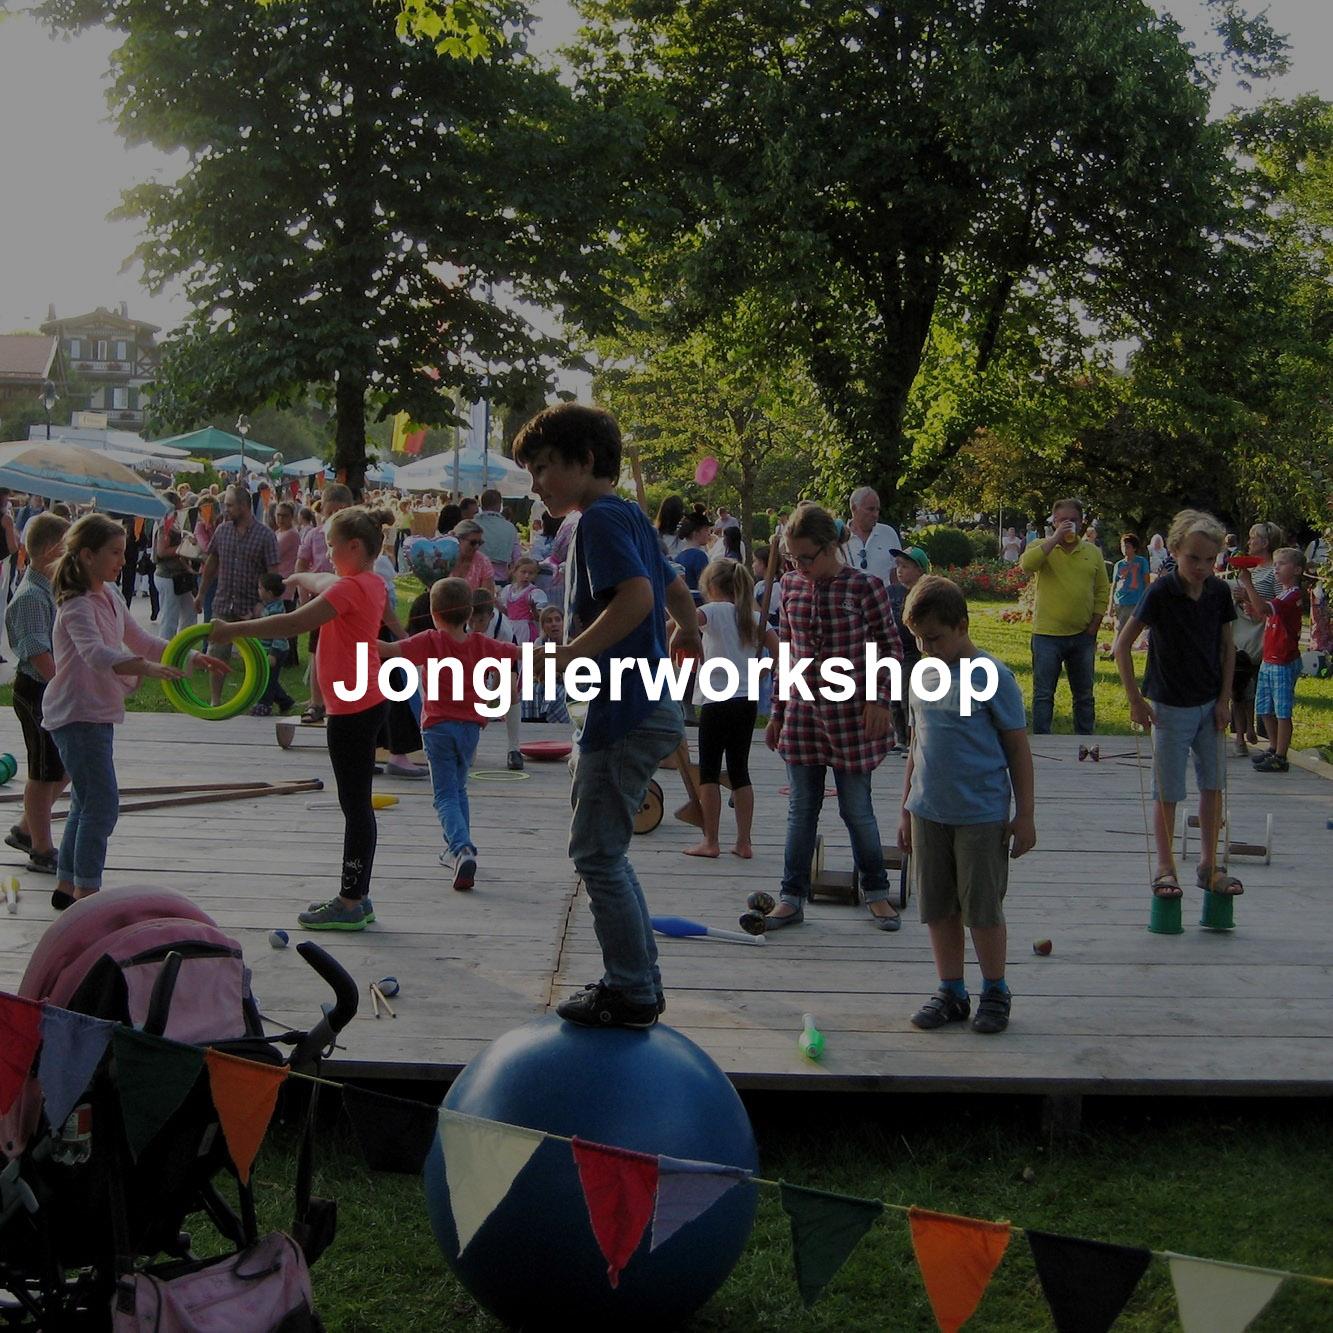 Jonglierworkshop beim Seefest Rottach Eggern am Tegernsee